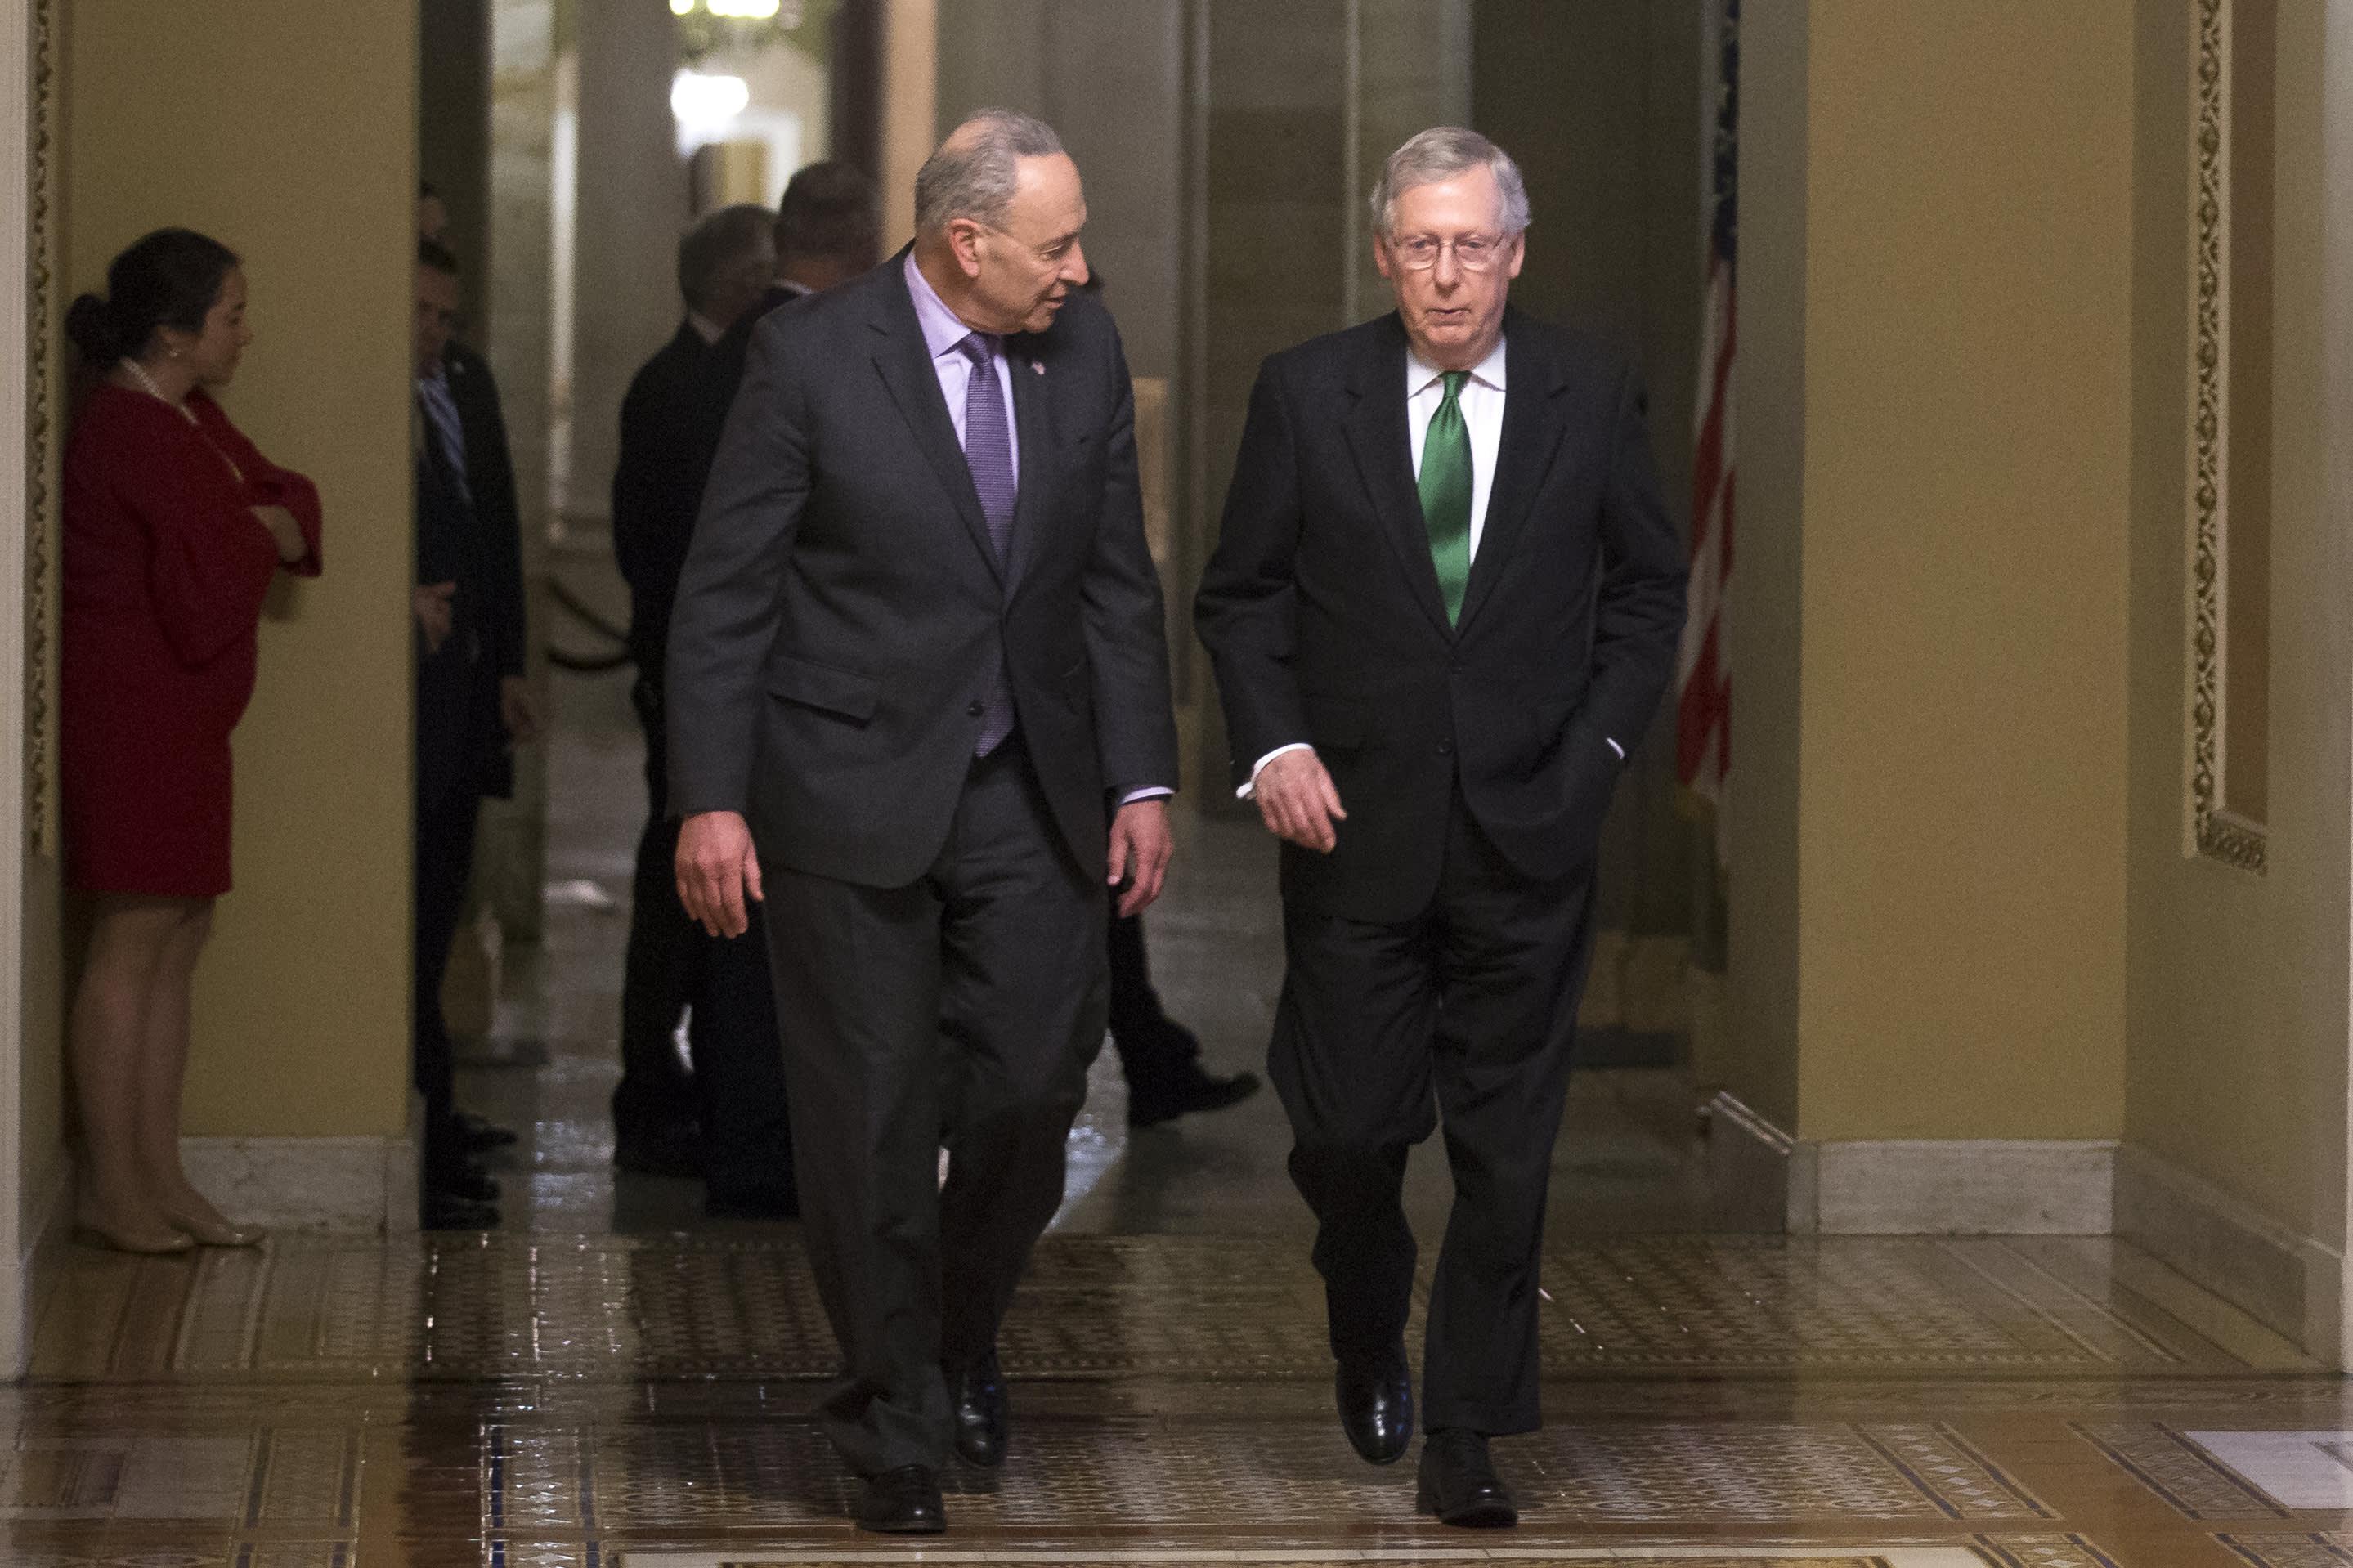 Senaatin republikaanijohtaja Mitch McConnell ja demokraattijohtaja Chuck Schumer